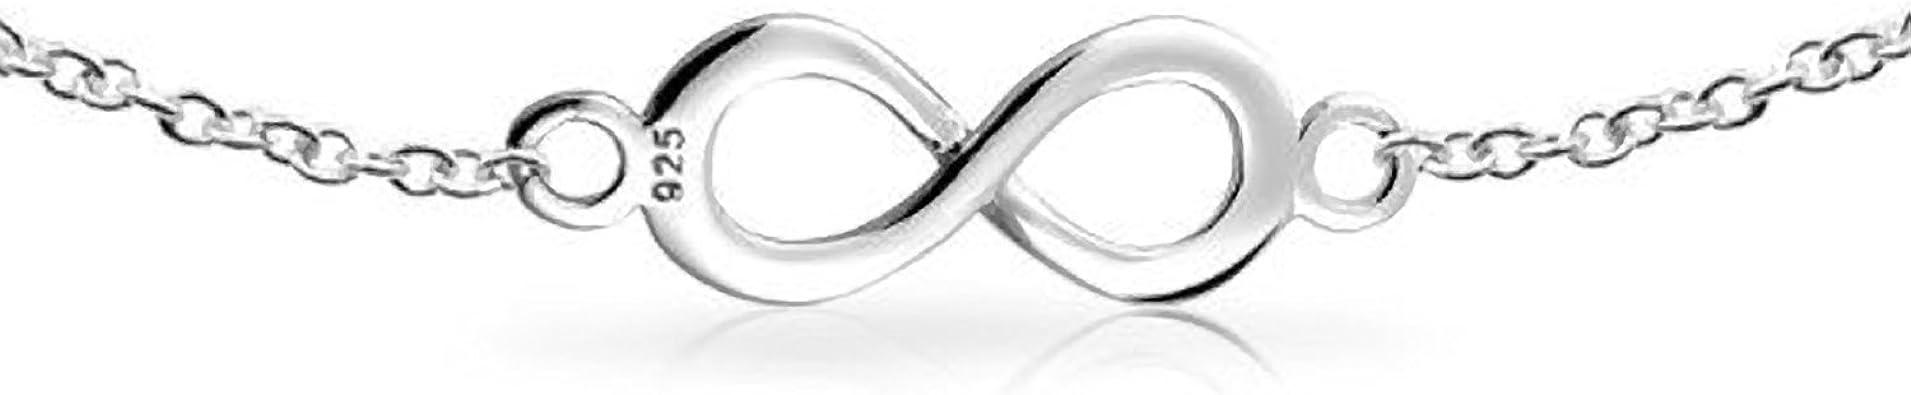 bracelet cheville grande taille